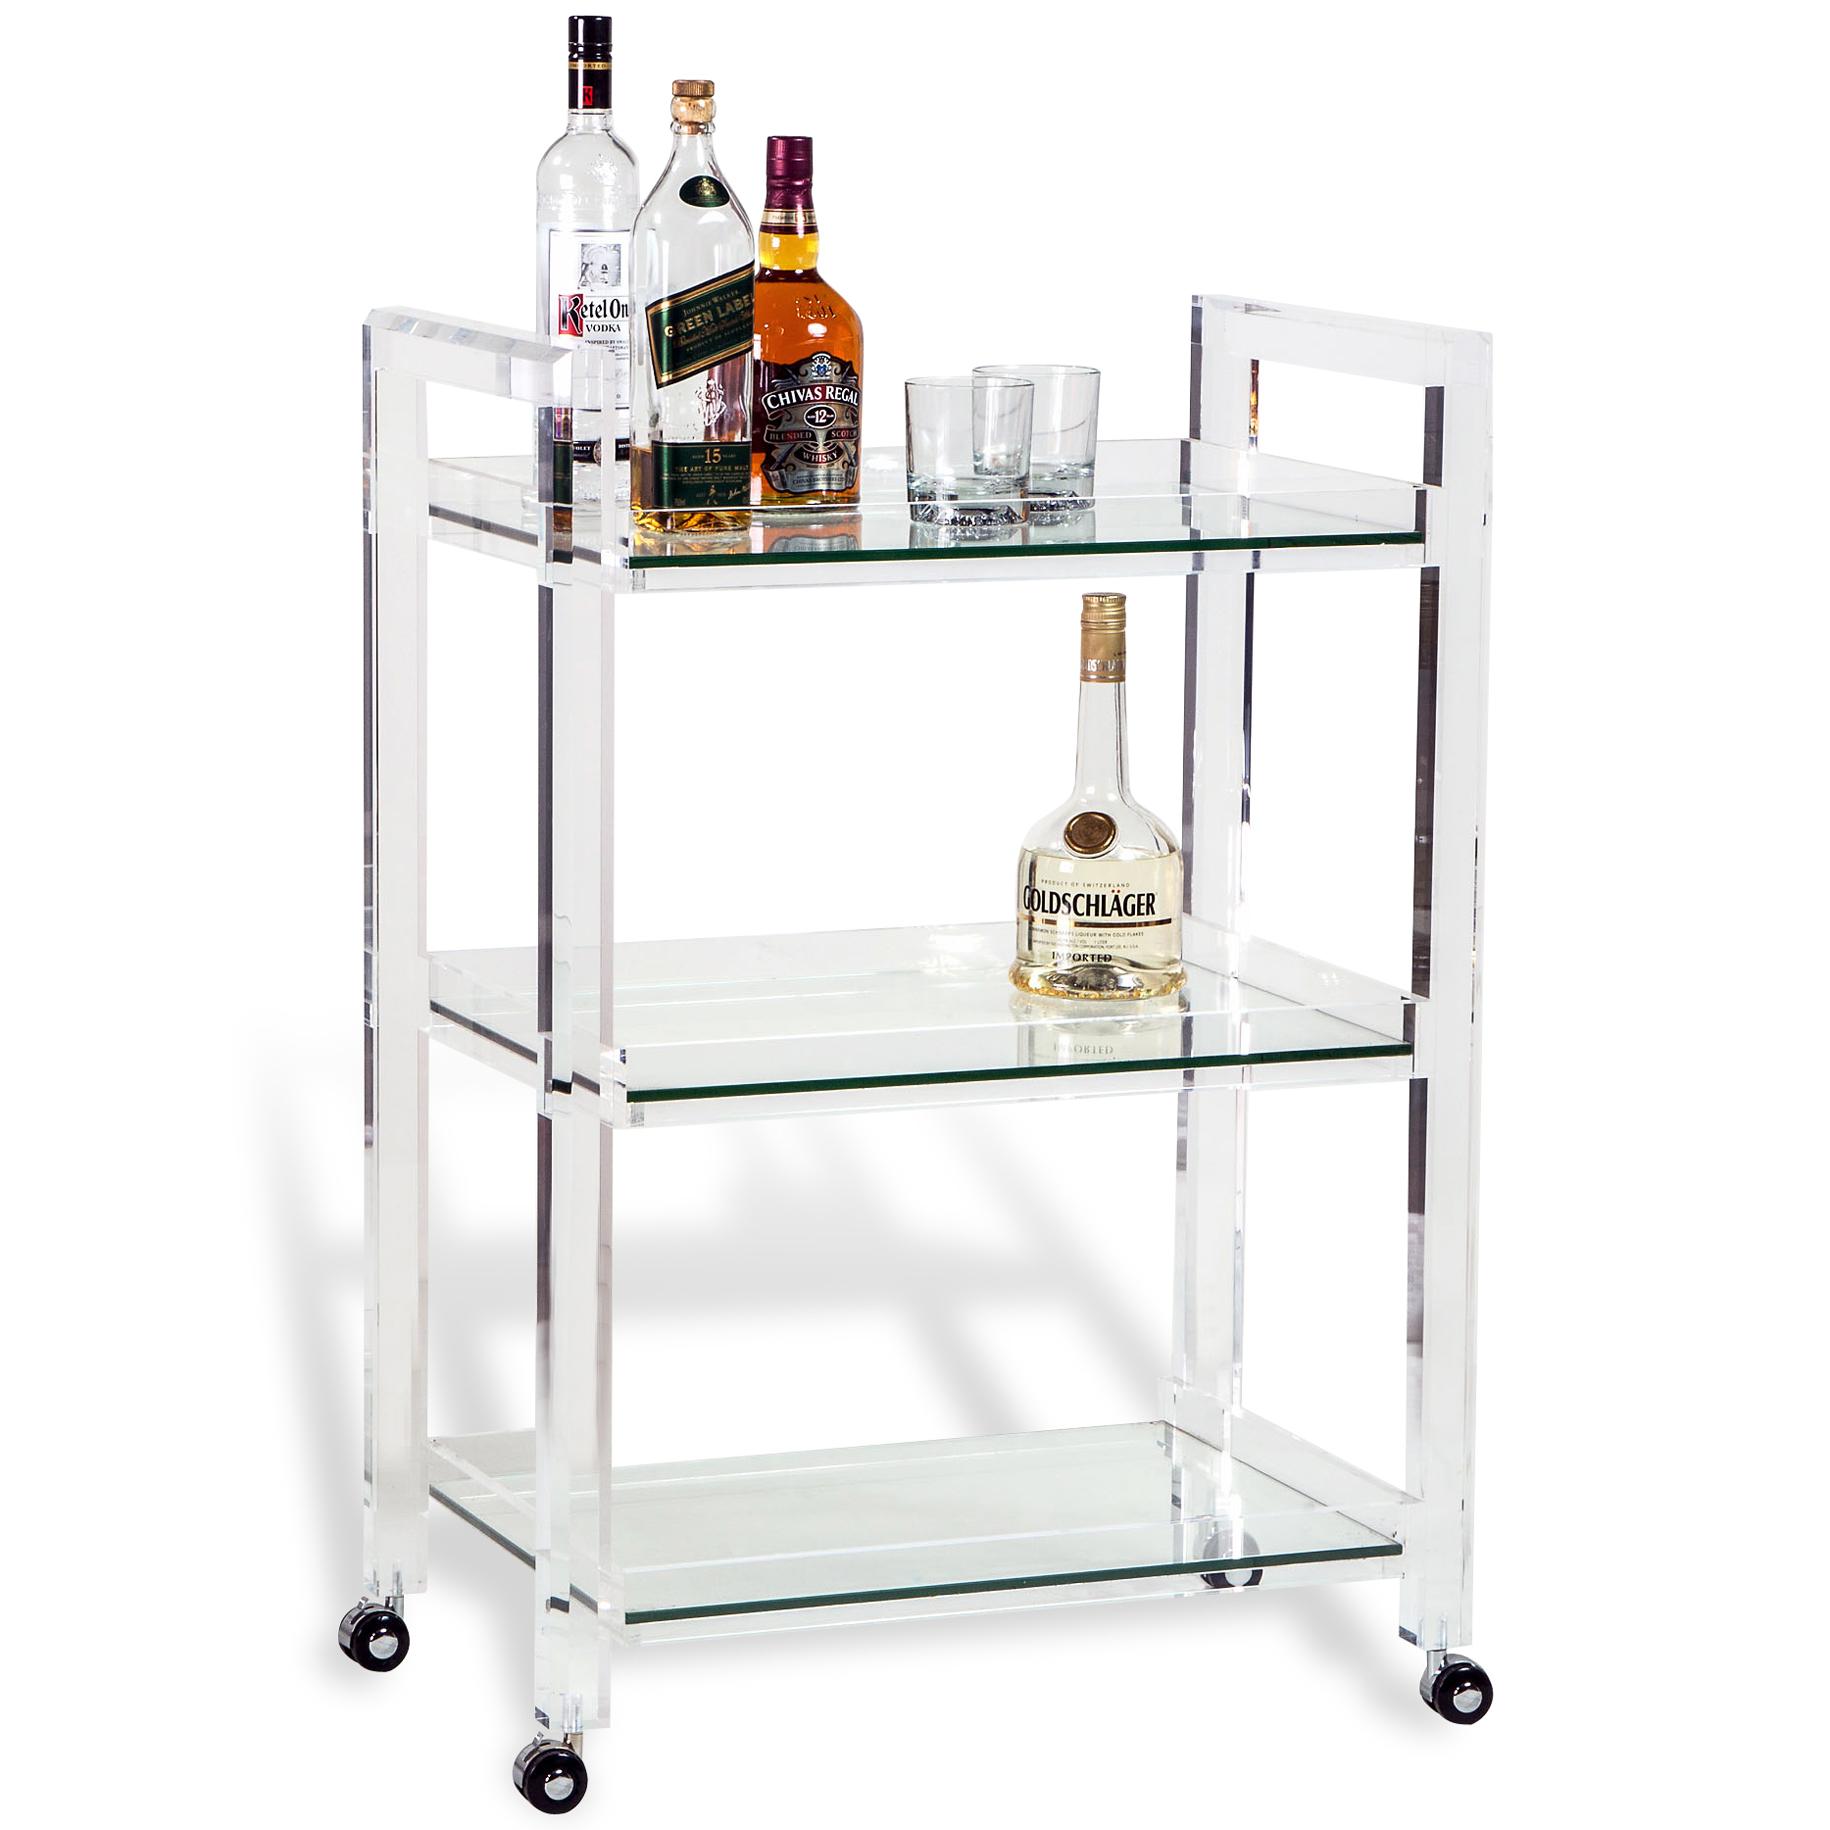 Interlude Ava Modern Acrylic And Glass Serving Bar Cart Kathy Kuo Blog Kathy Kuo Home Kathy Kuo Blog Kathy Kuo Home